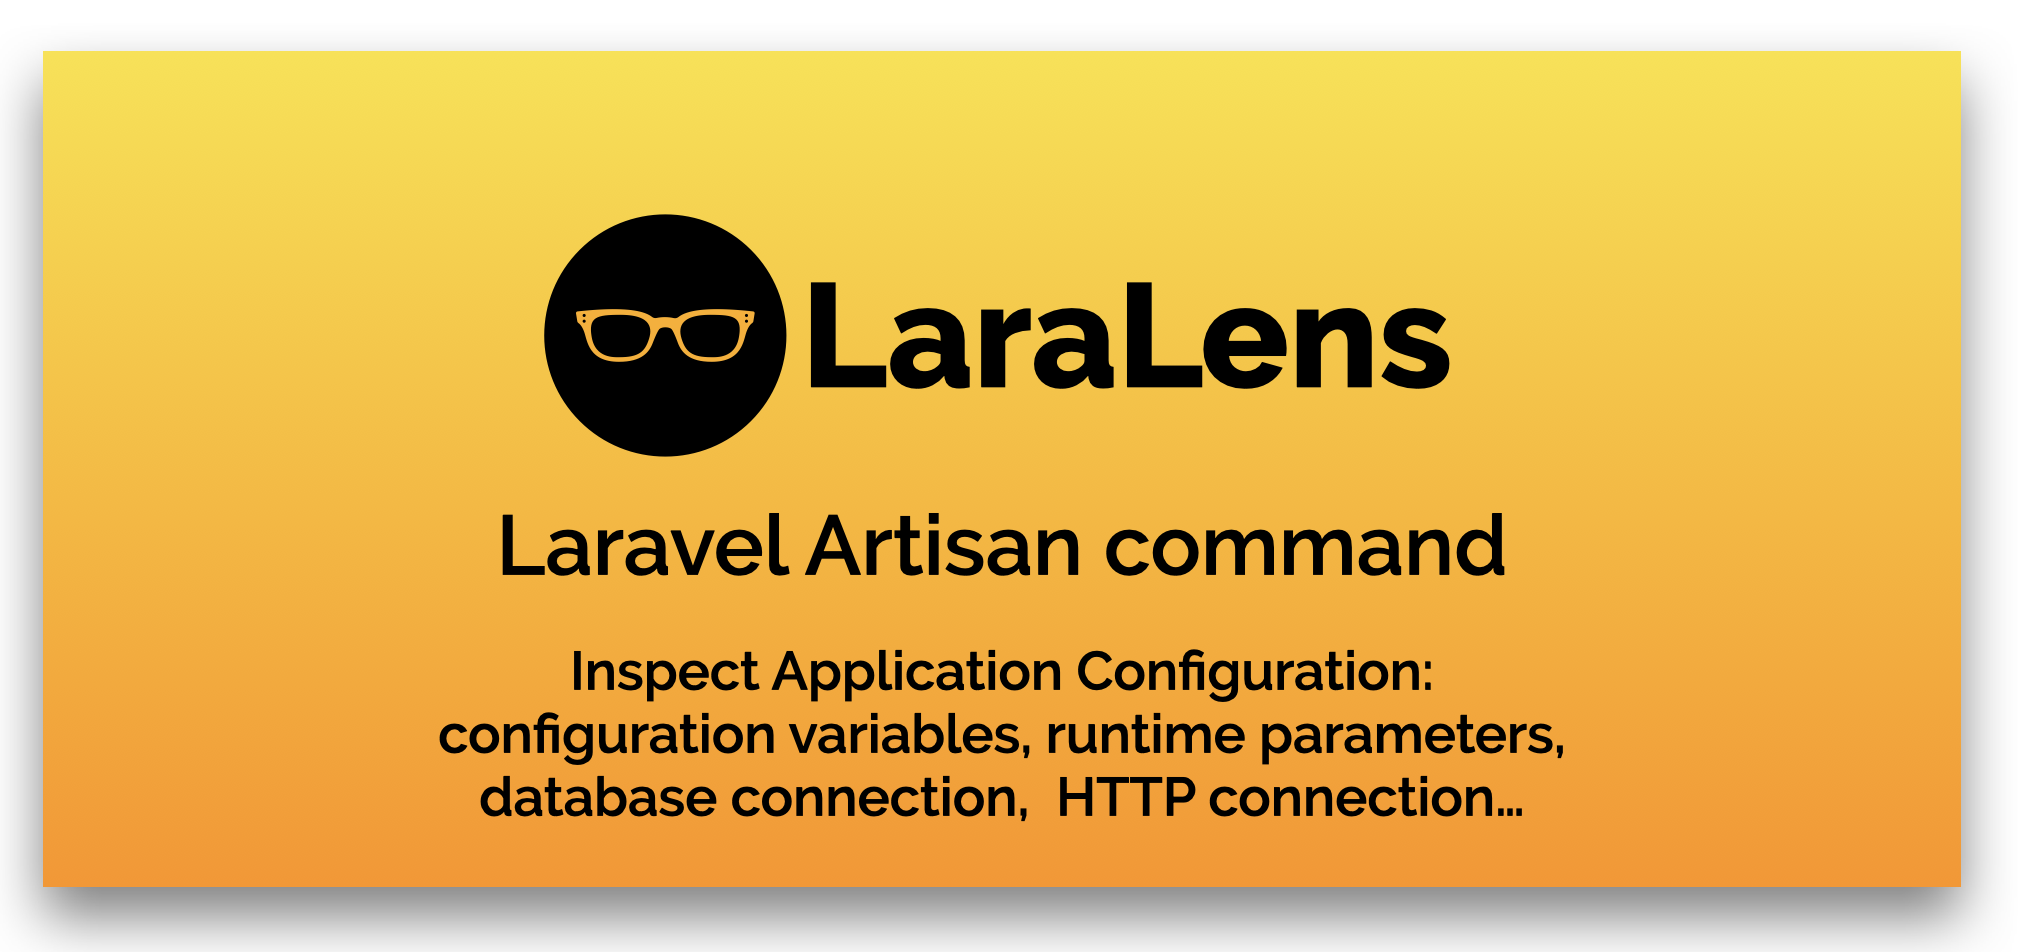 LaraLens